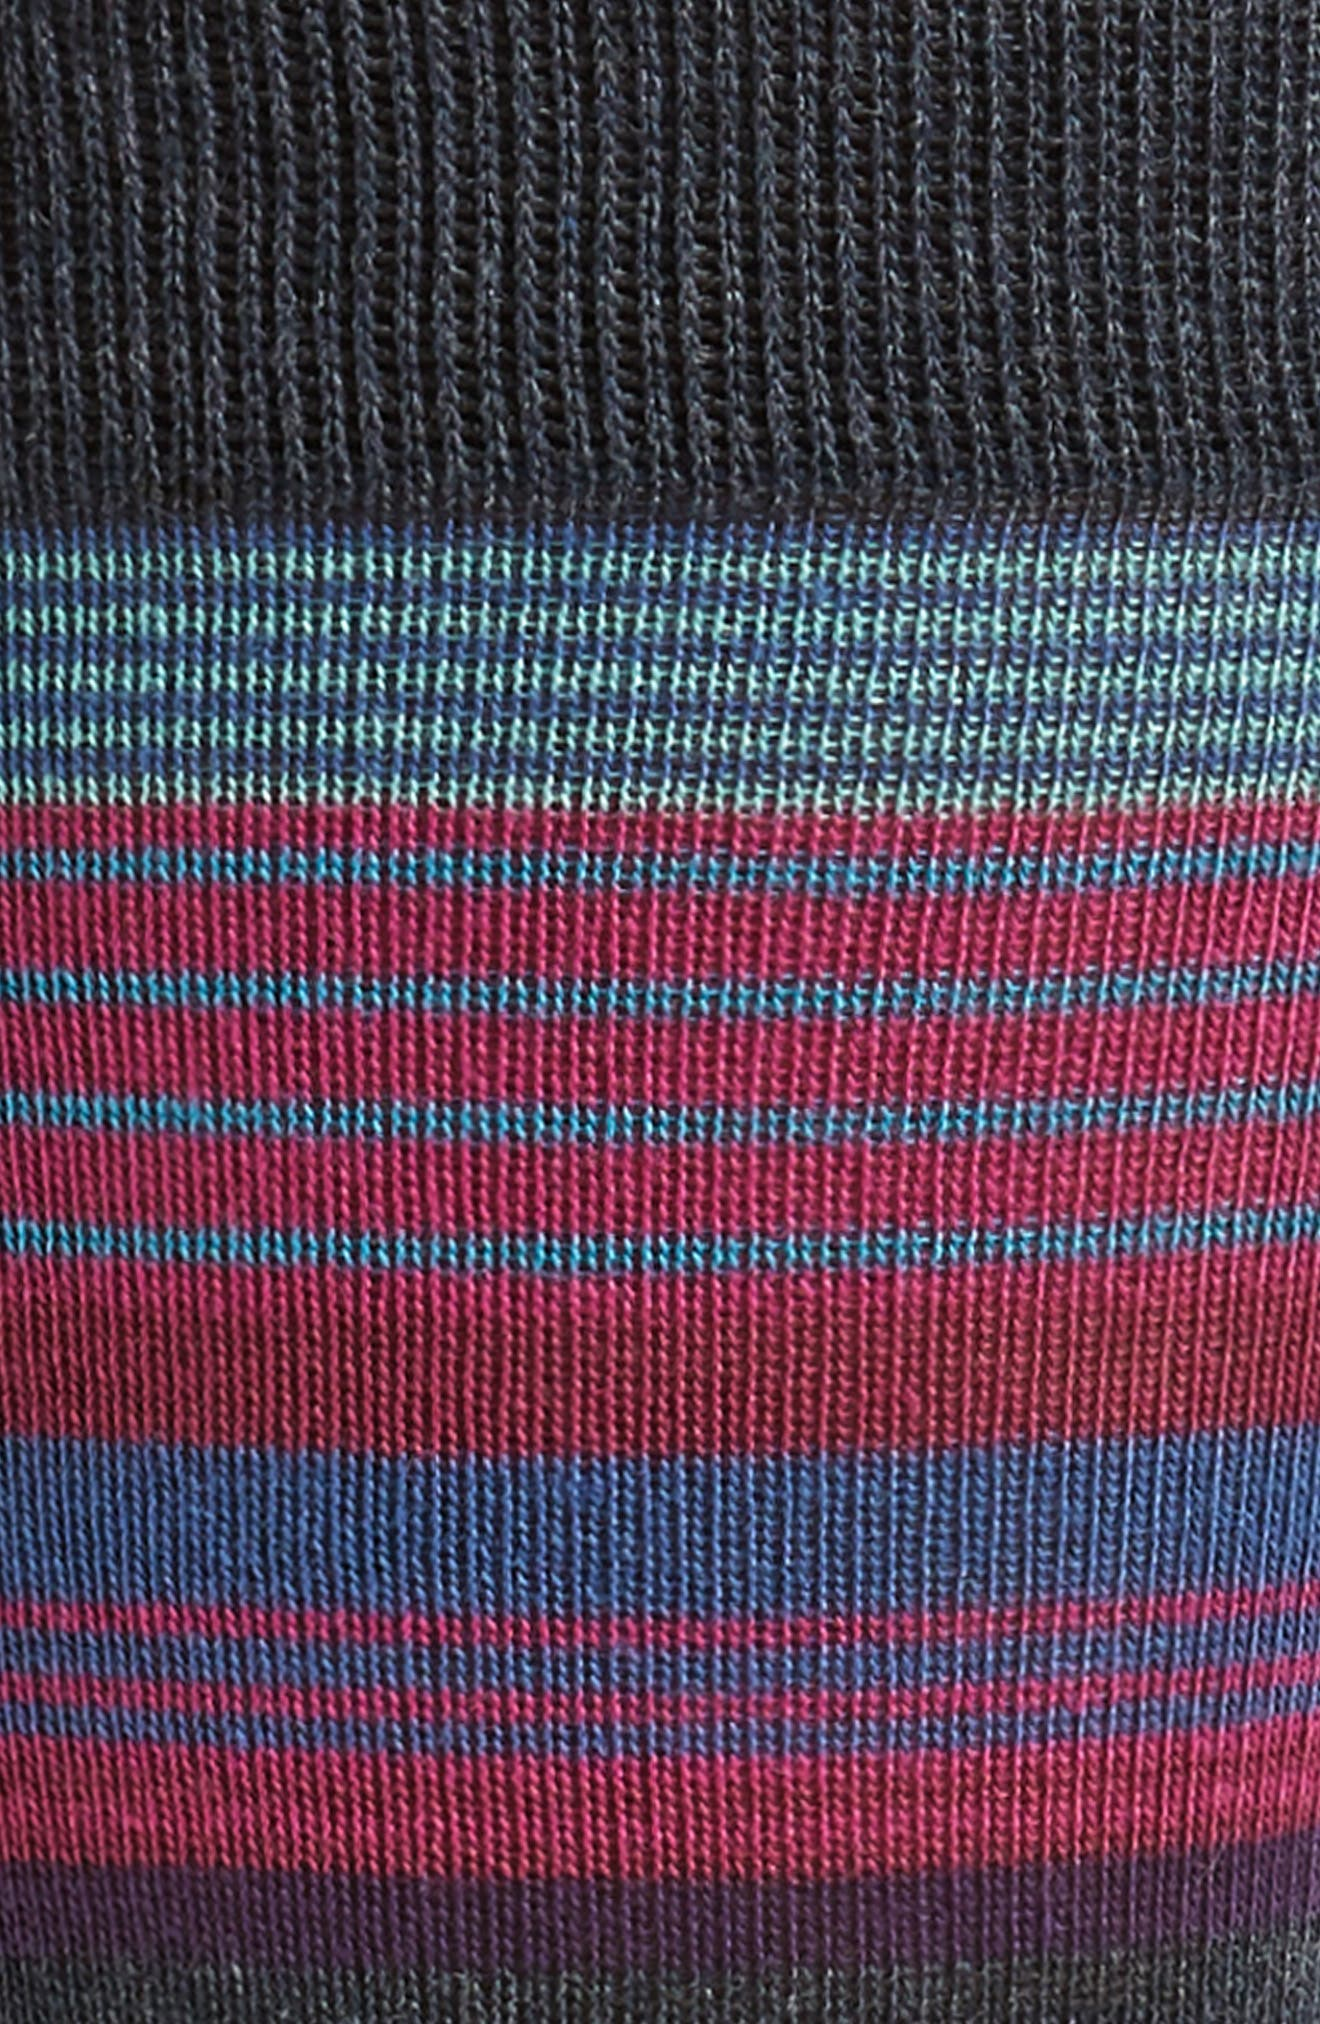 Variegated Stripes Socks,                             Alternate thumbnail 2, color,                             410